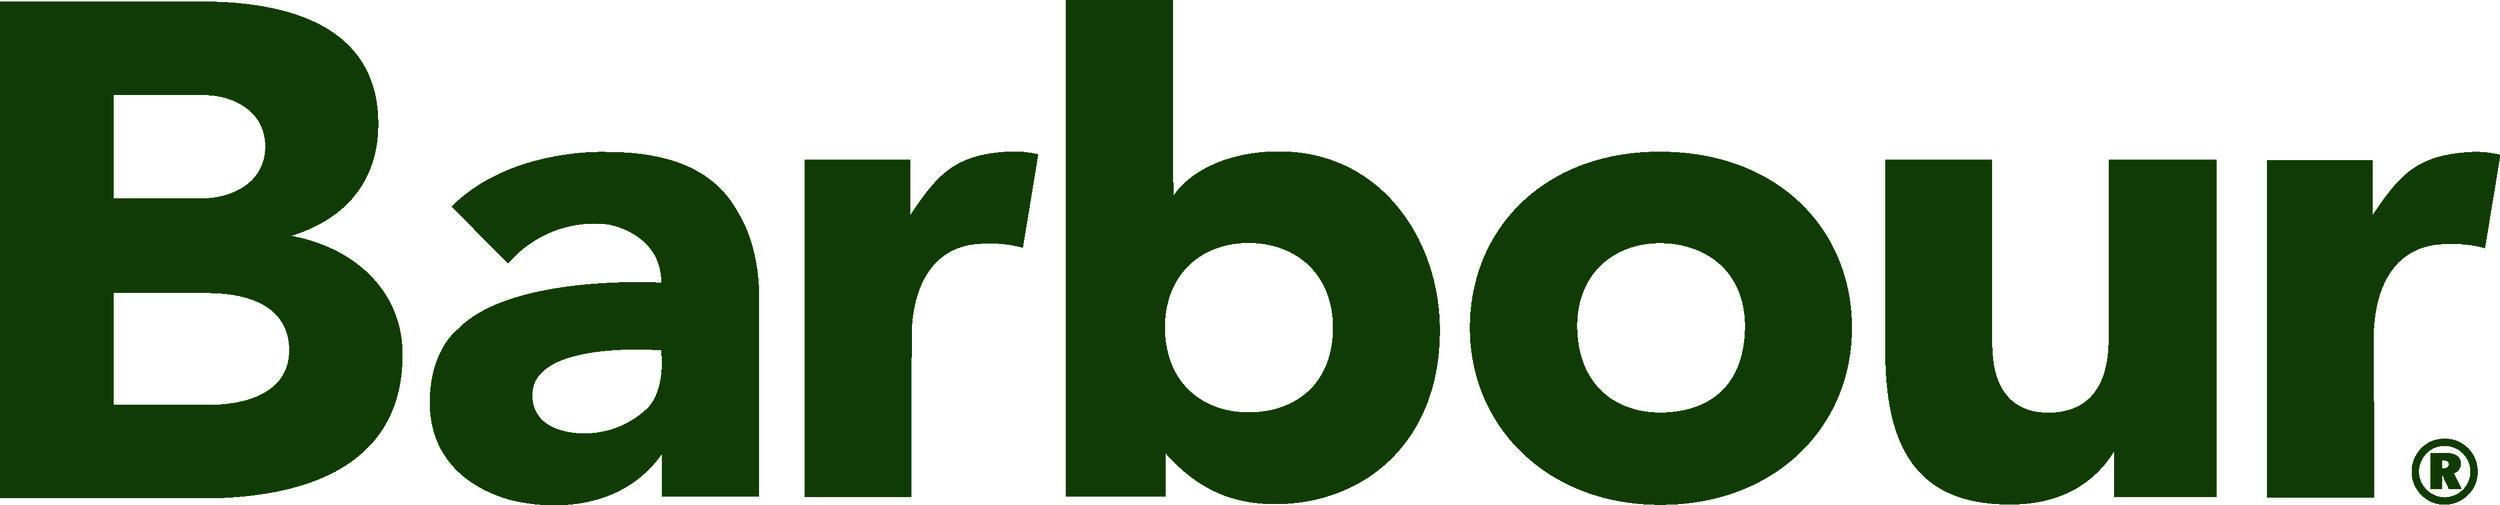 BARBOUR Logo CMYK Green (2).jpg